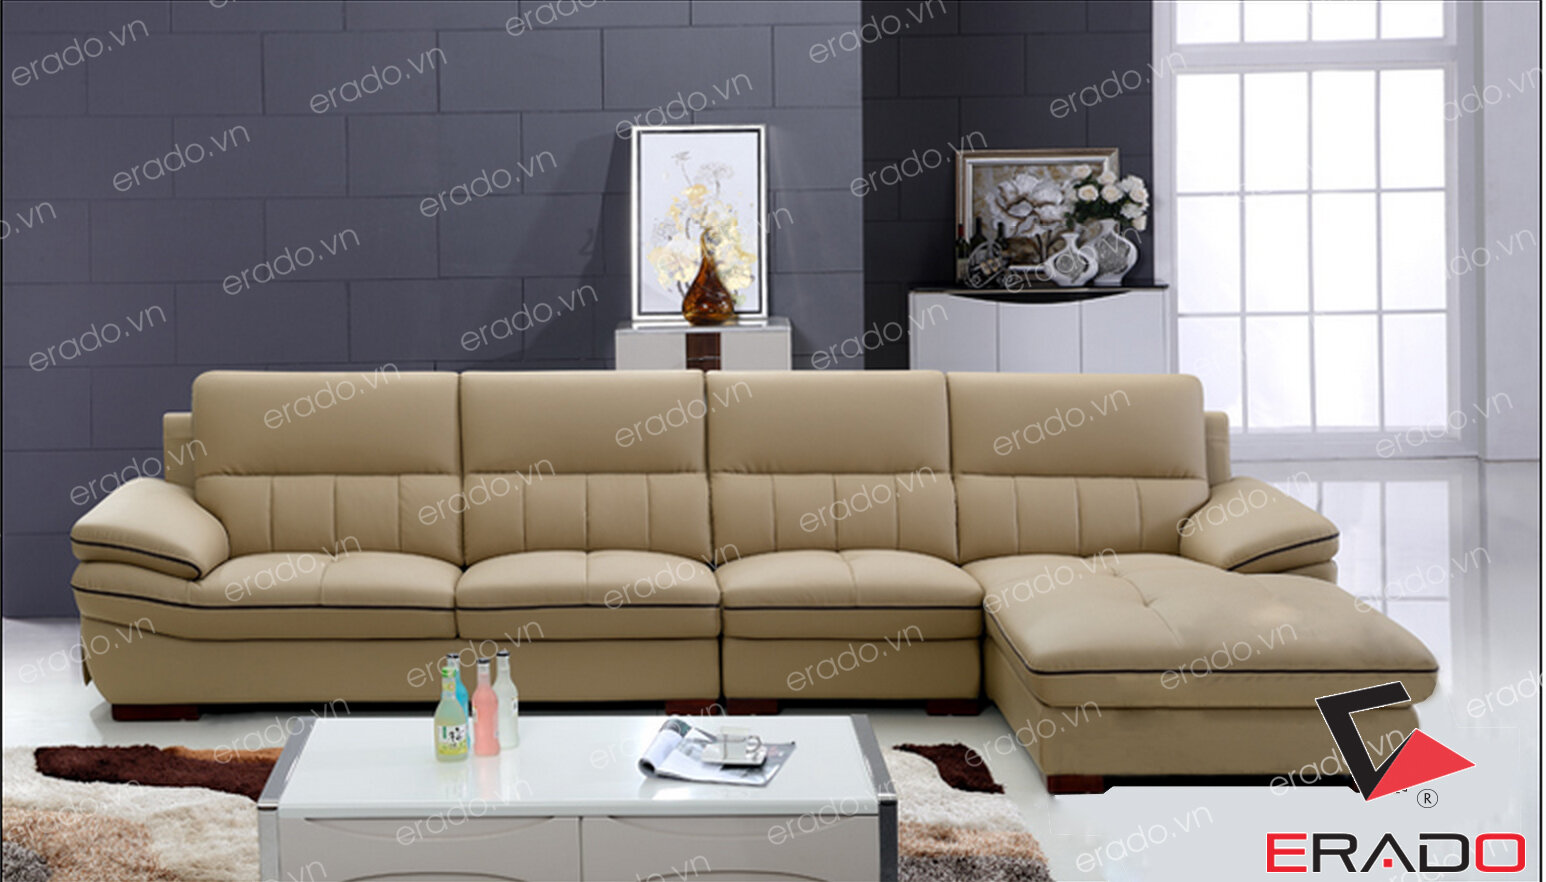 Sofa da mã 306